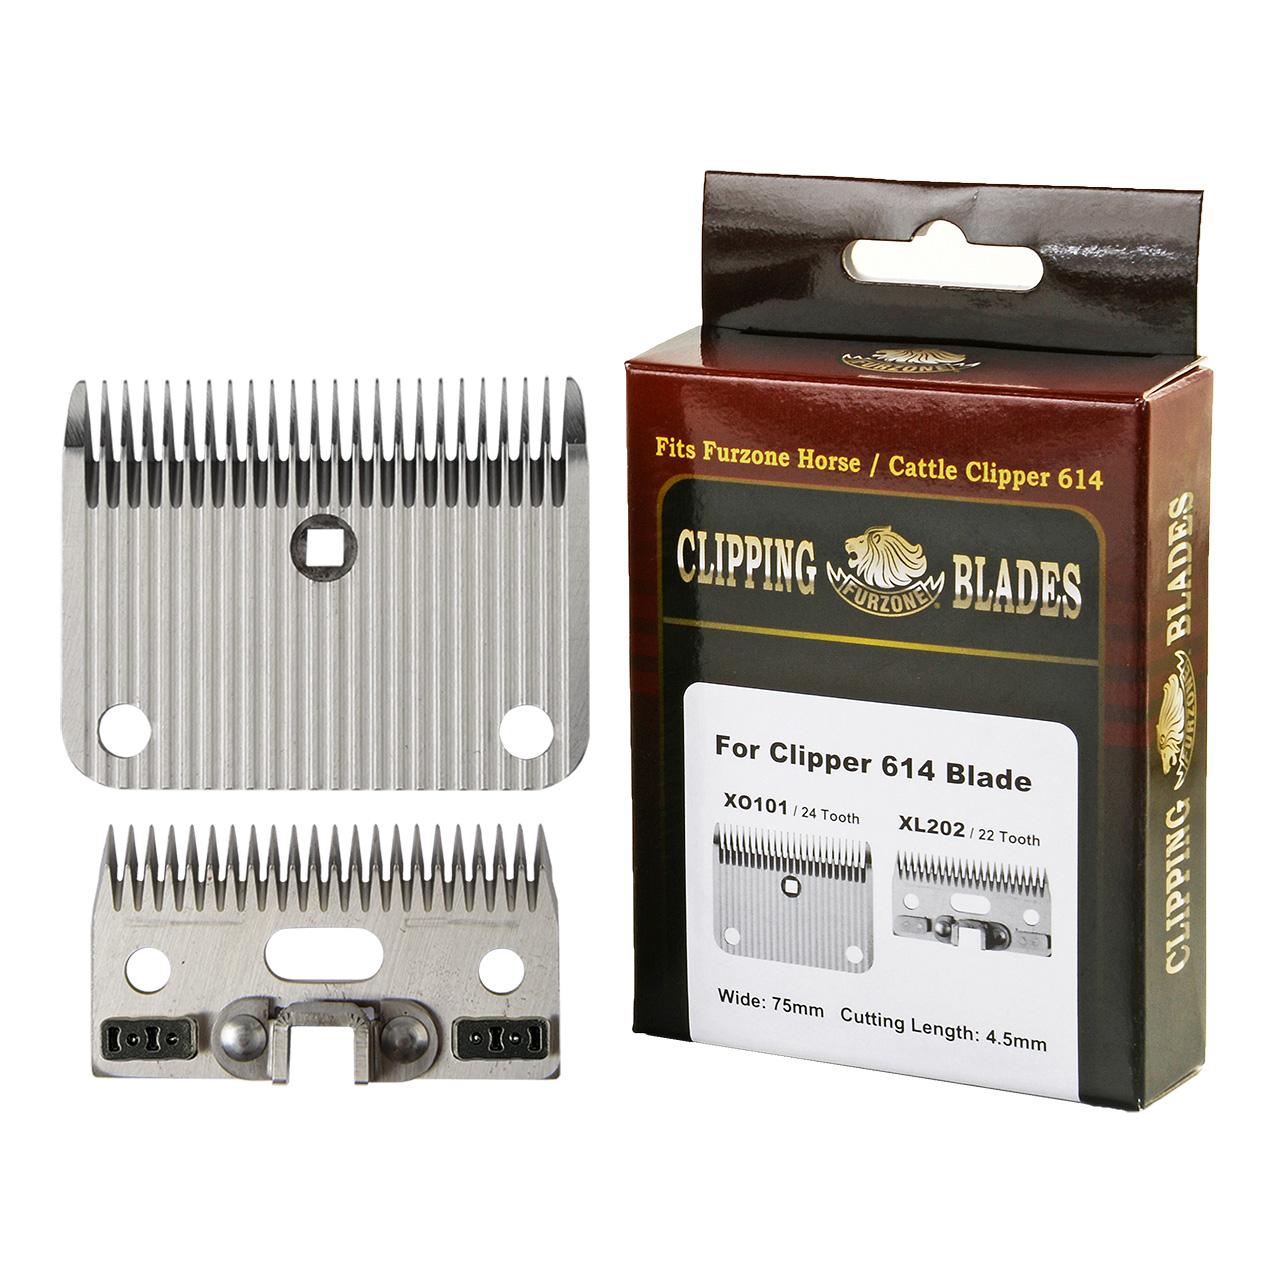 furzone model 614 clipper blade  #X0101 cutting length 4.5mm